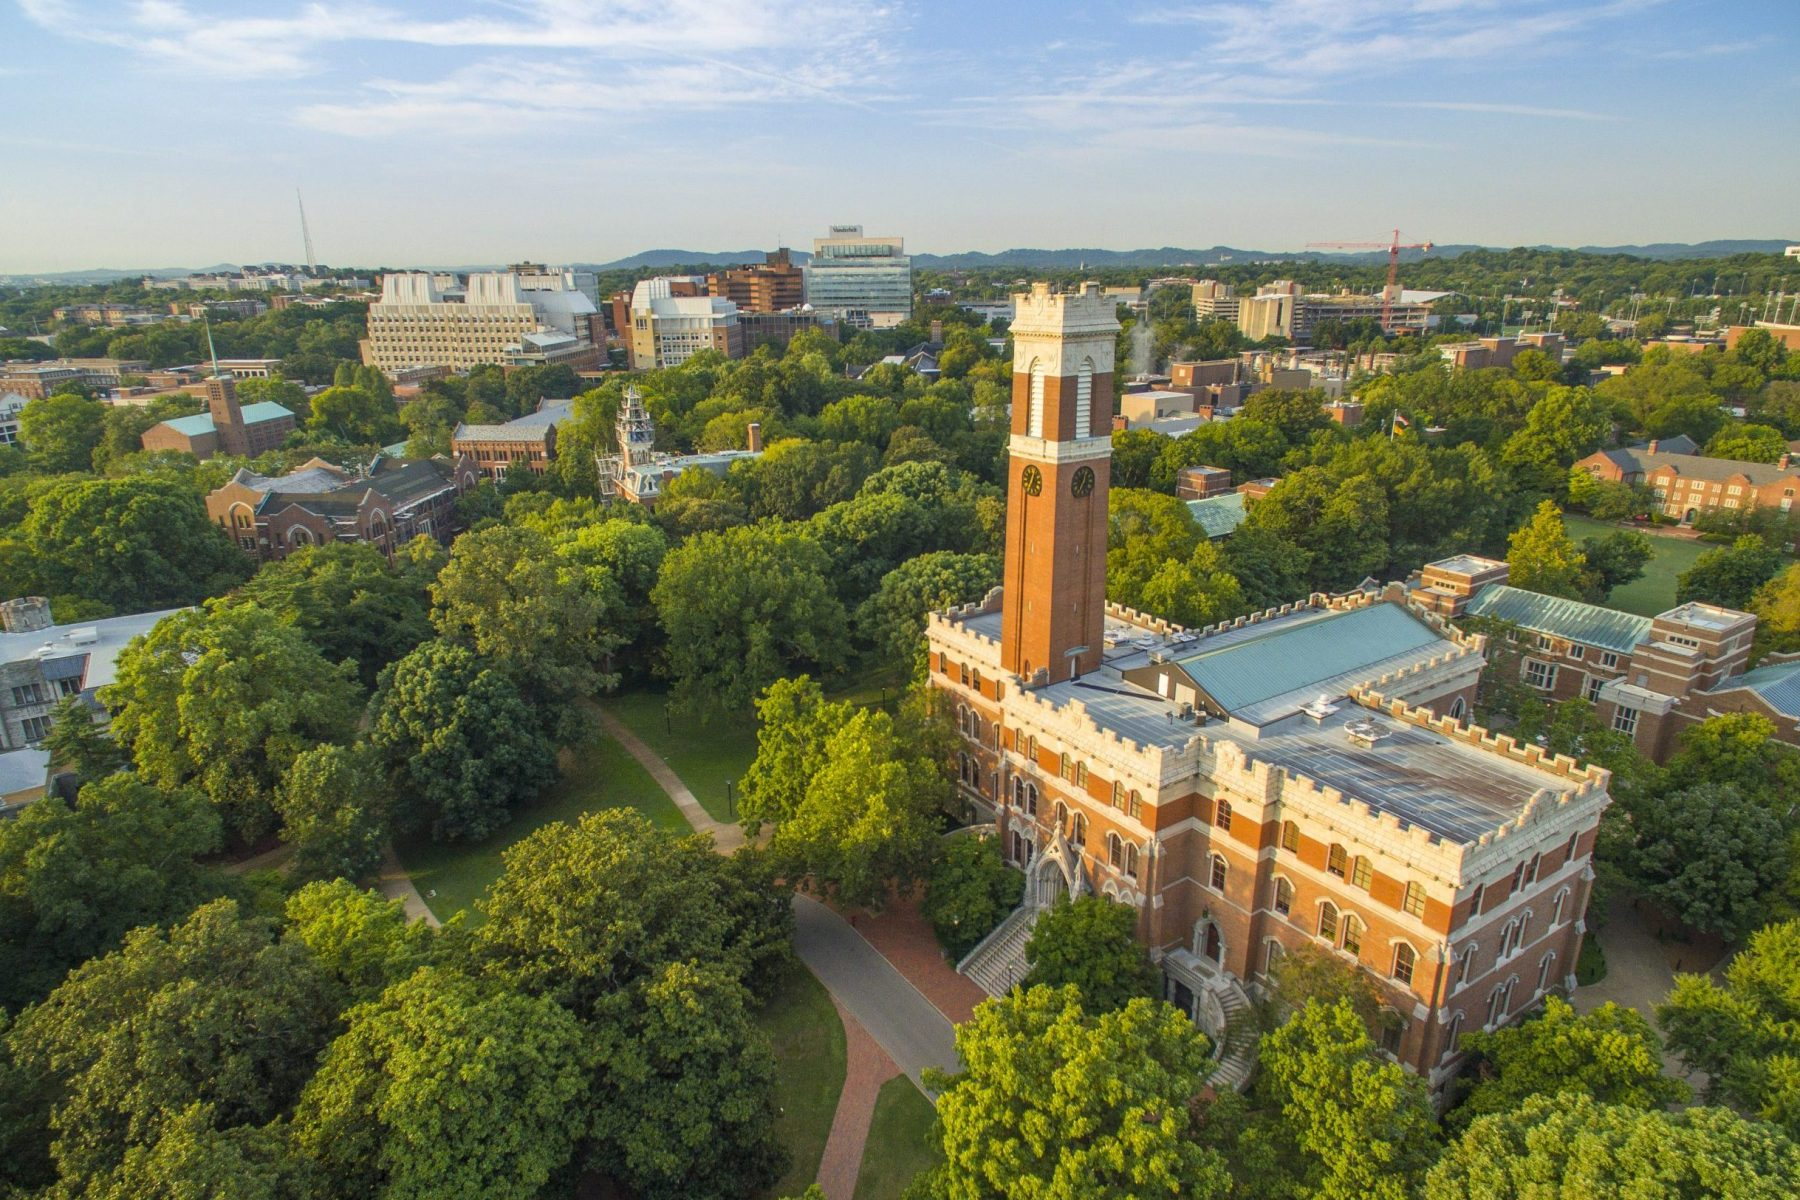 aerial campus photo with Kirkland Hall